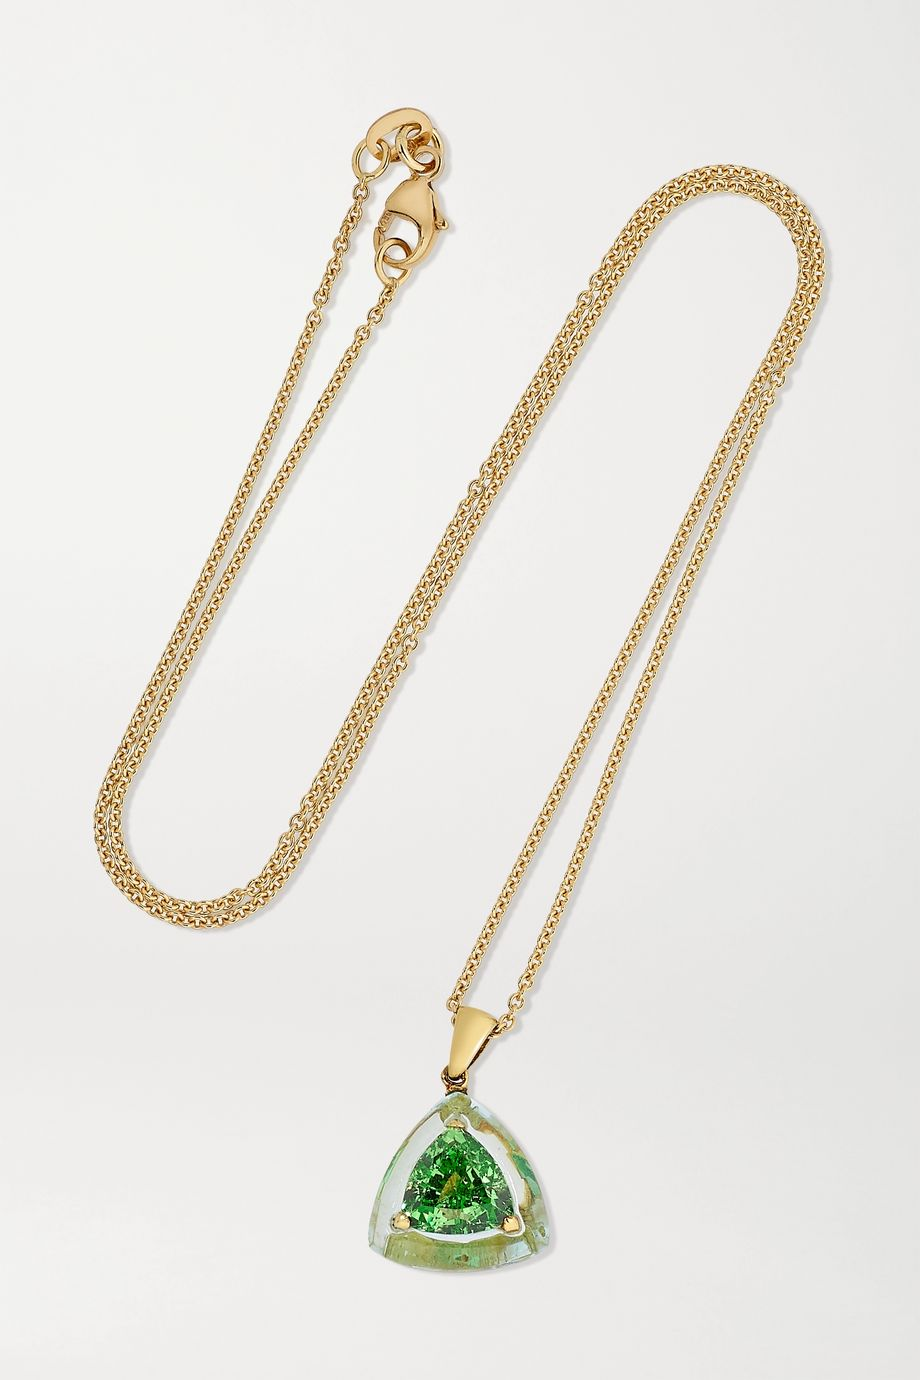 Boghossian 18-karat gold, aquamarine and tsavorite necklace